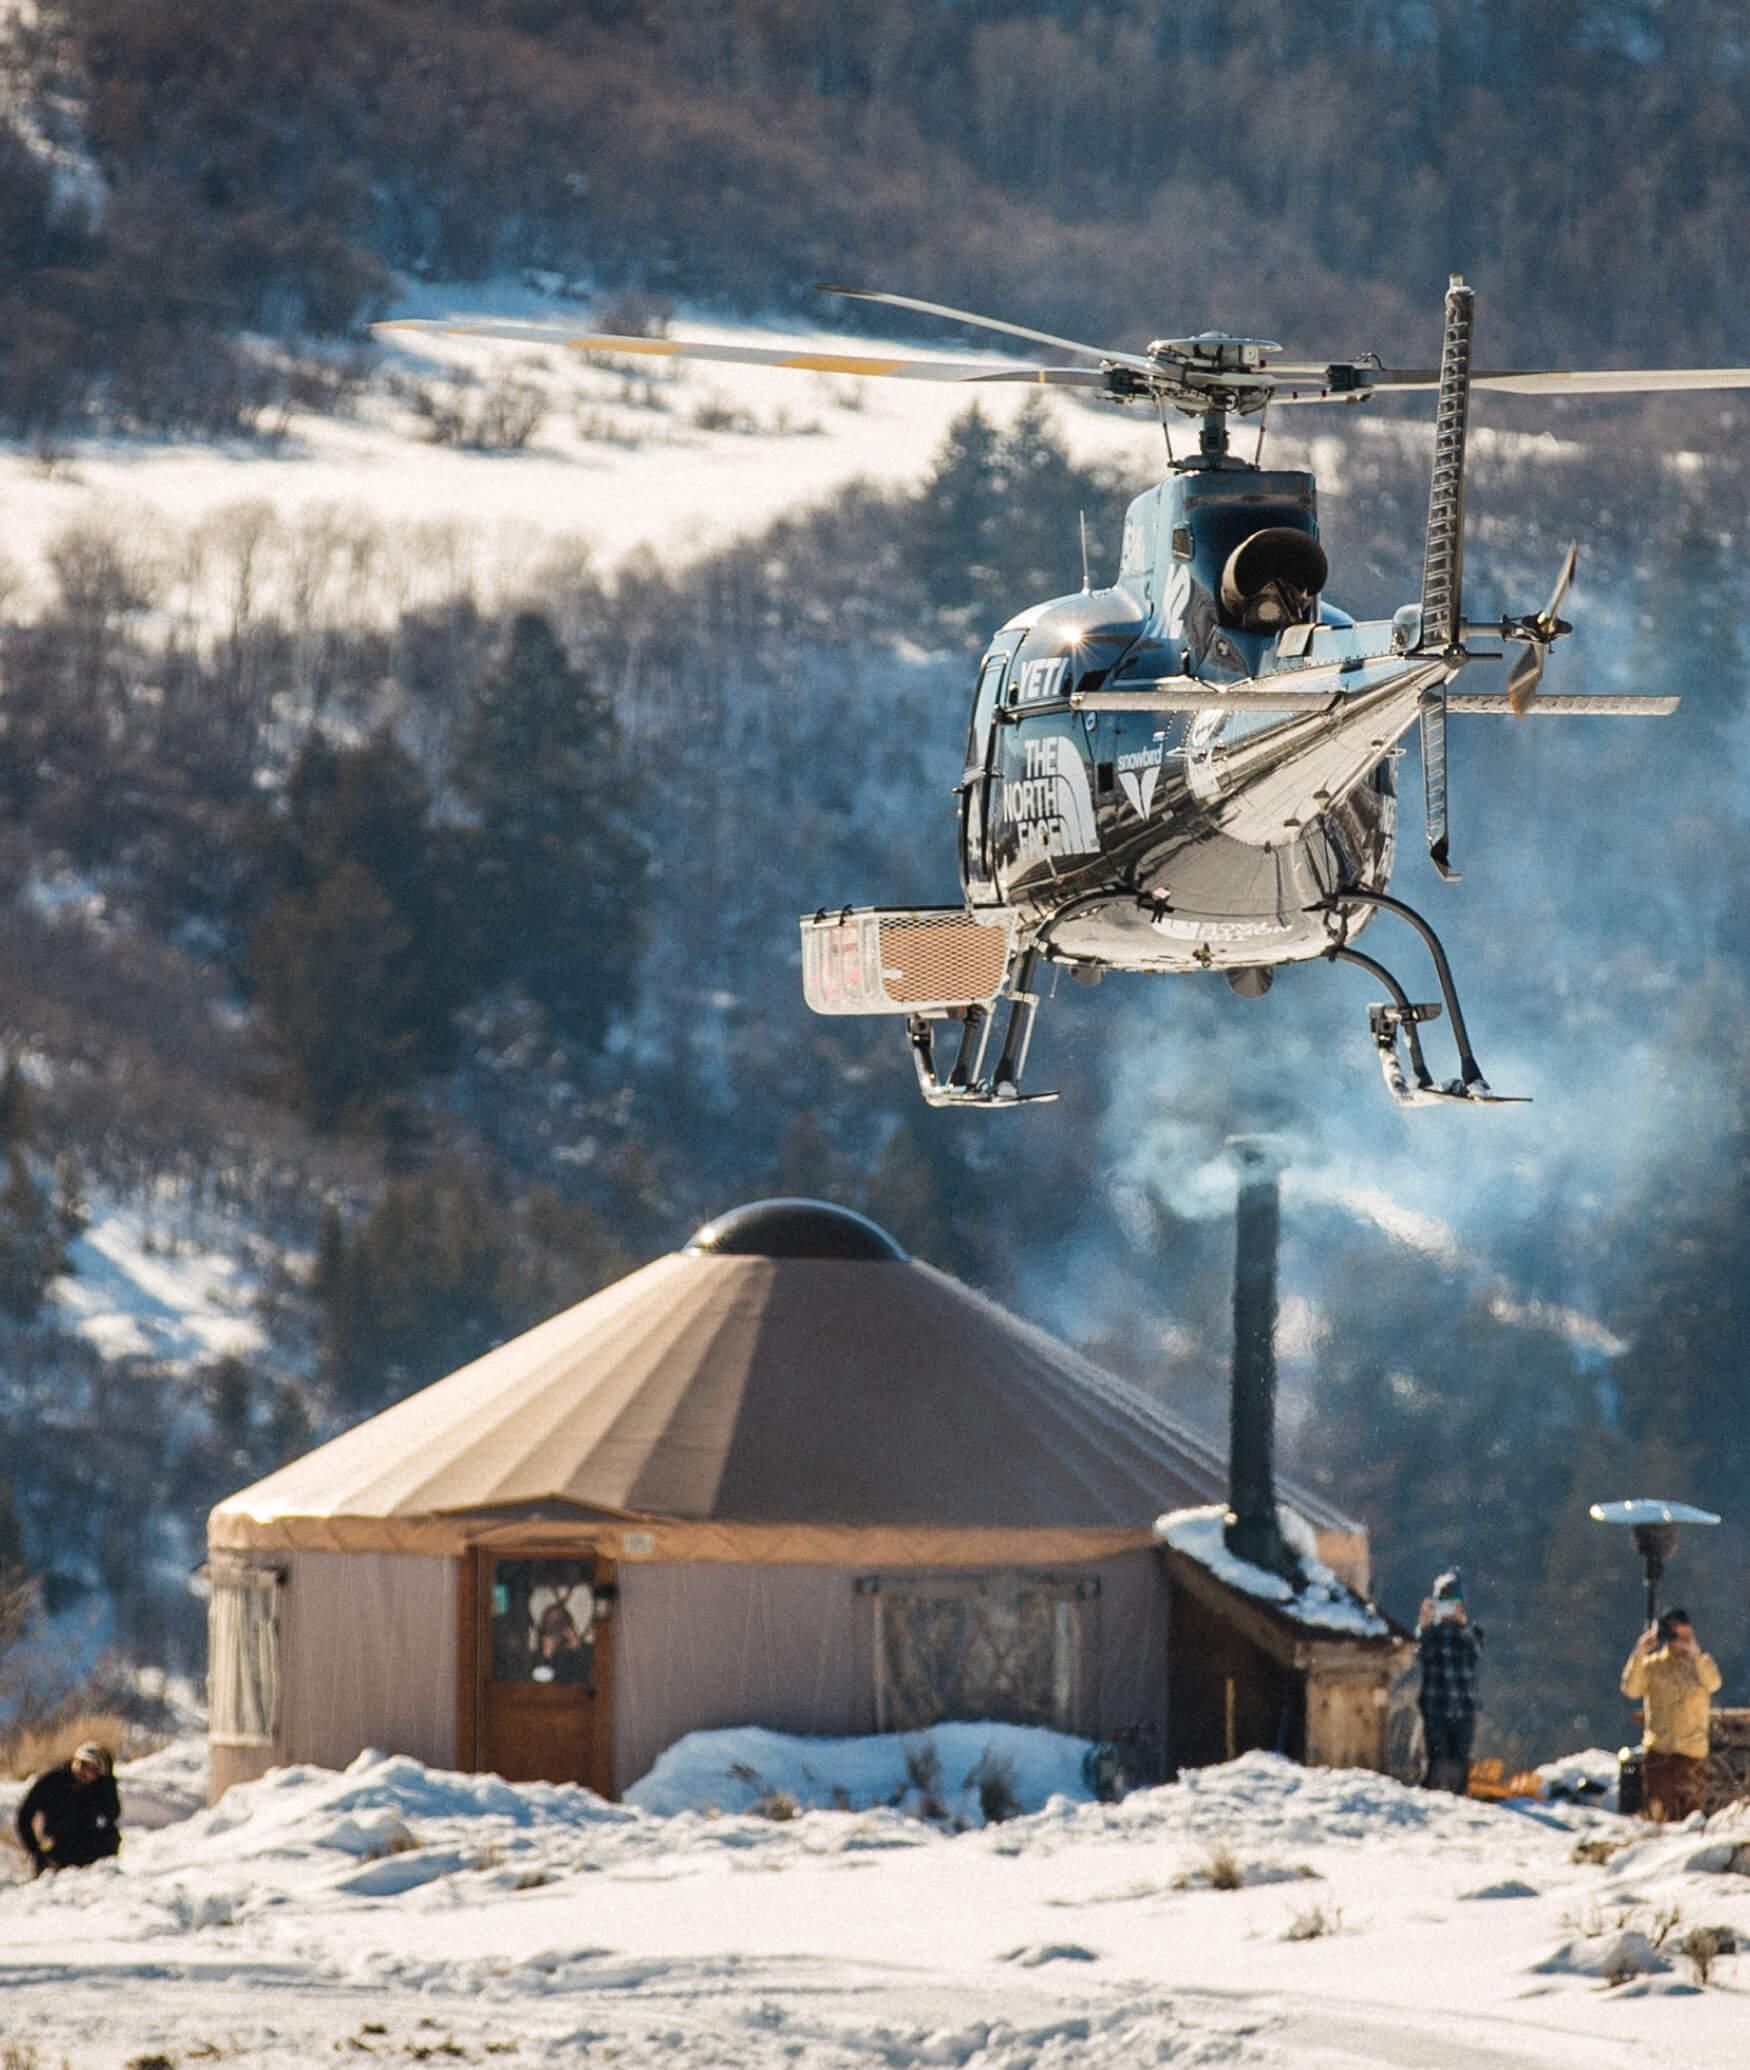 Blue Sky Resort Helicopter Adventure